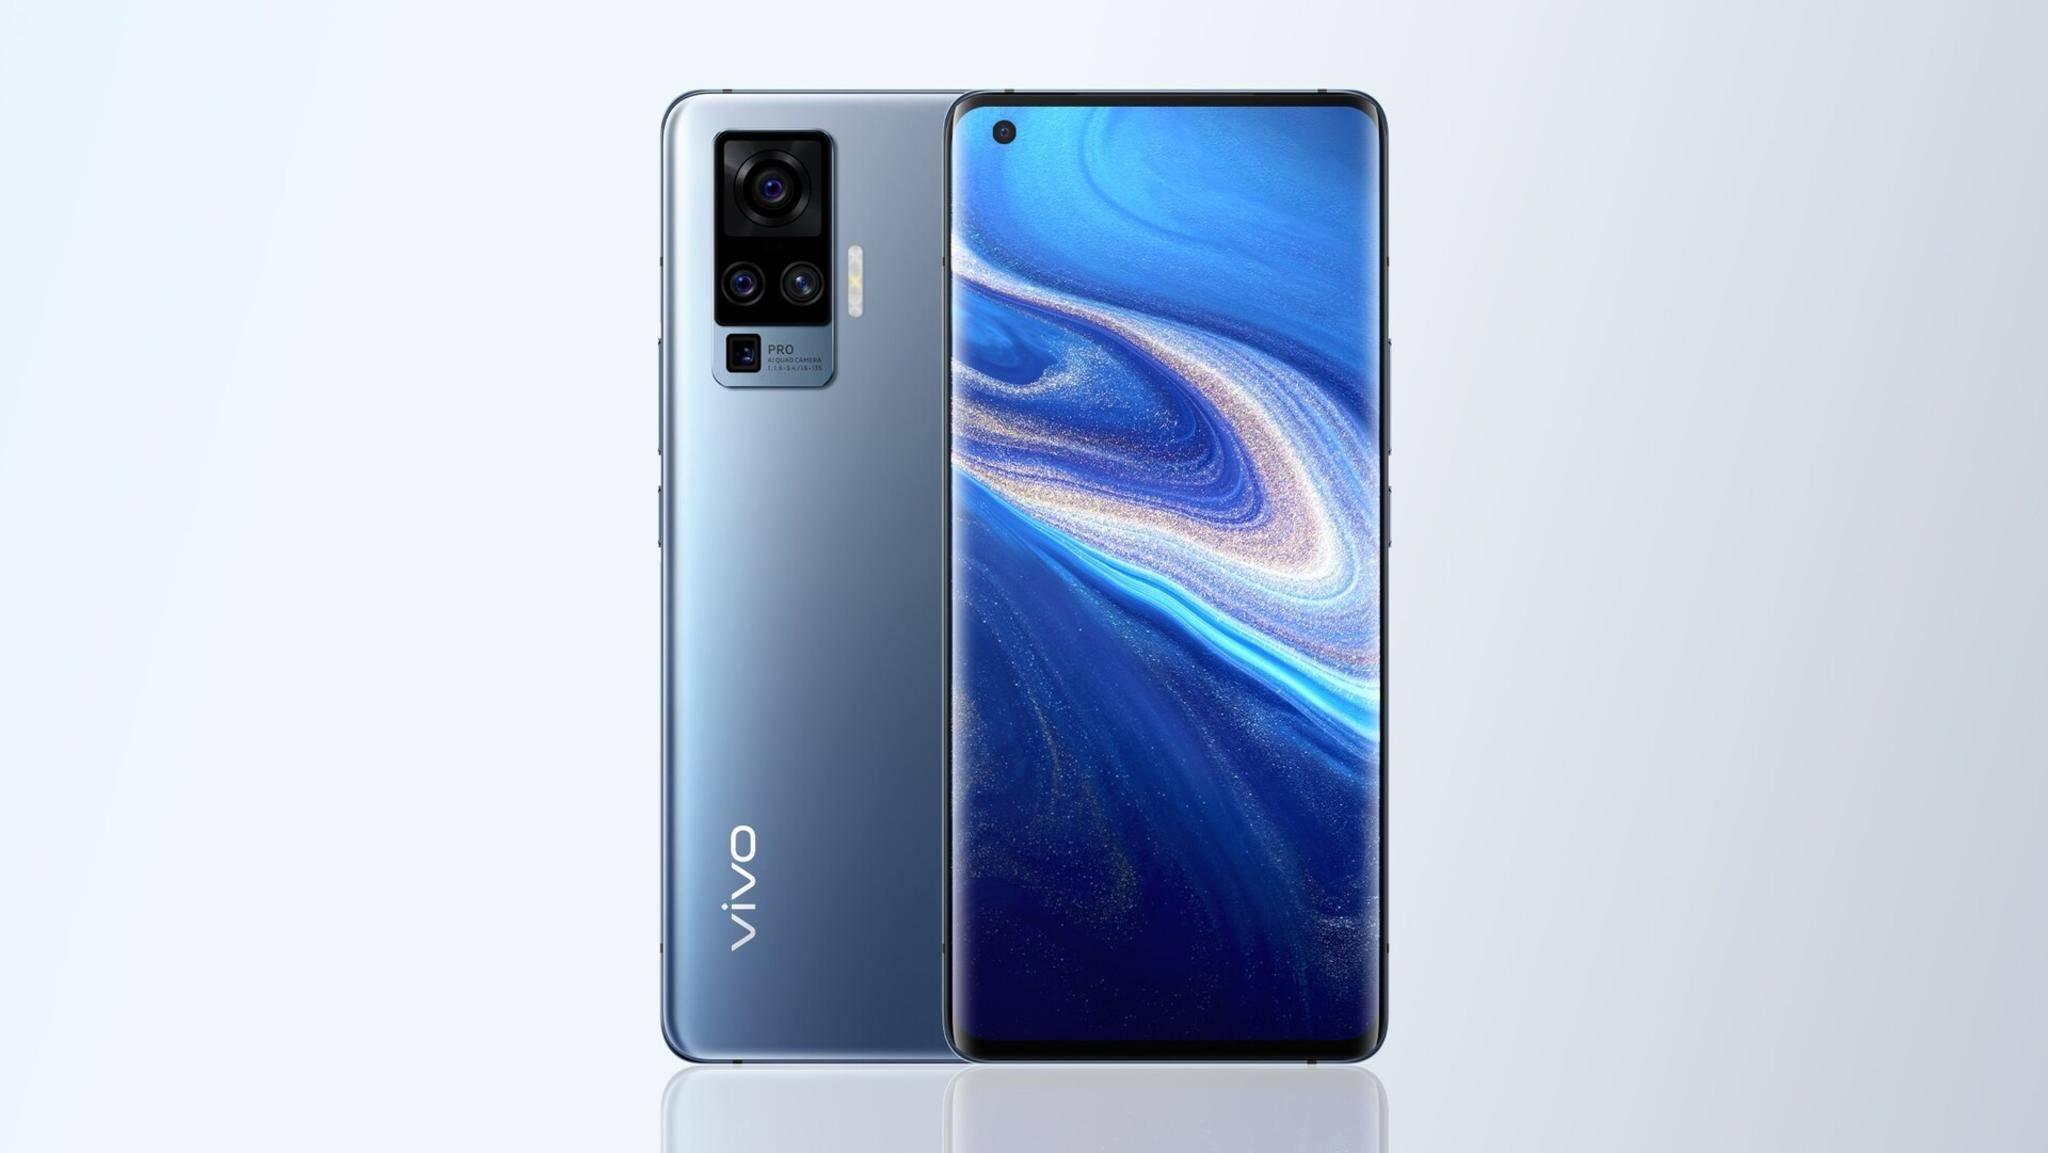 vivo-x51-smartphone